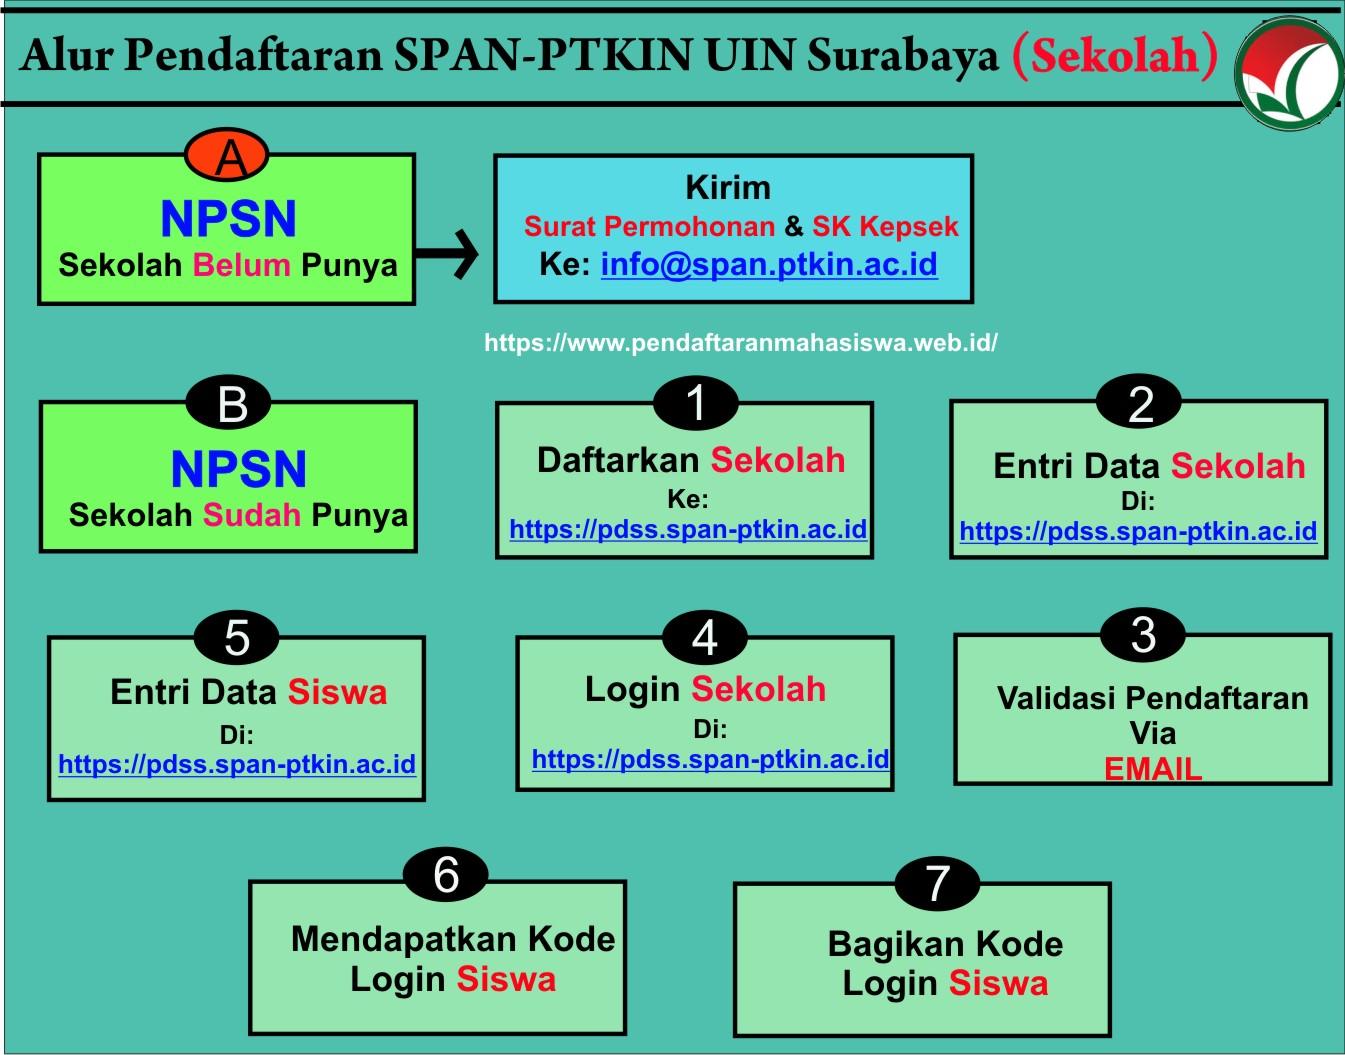 Pendaftaran Mahasiswa Baru Uin Sa Surabaya S1 S2 S3 T A 2021 2022 Pendaftaran Mahasiswa